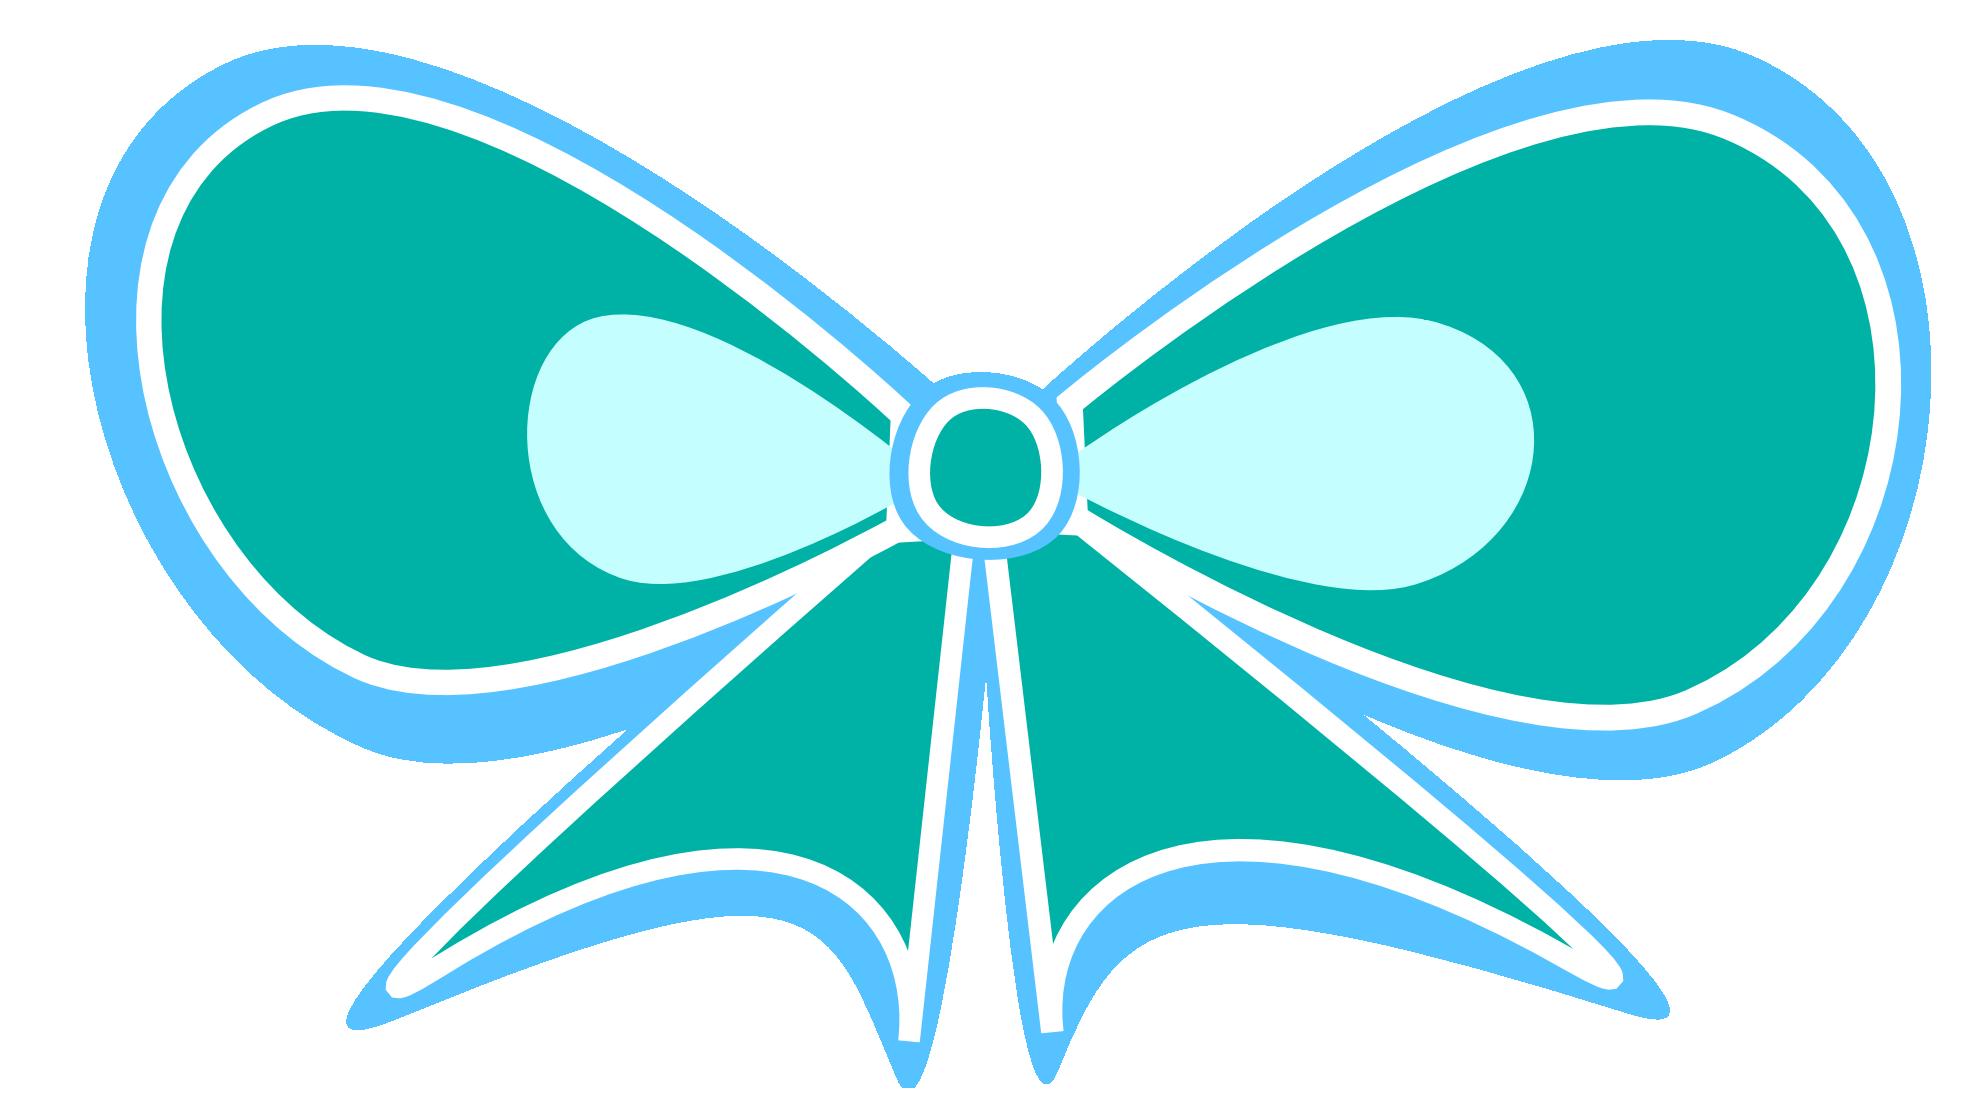 Ribbon butterfly clipart clip art clipartist.net » Clip Art » Butterfly blue ribbon openclipart.org ... clip art